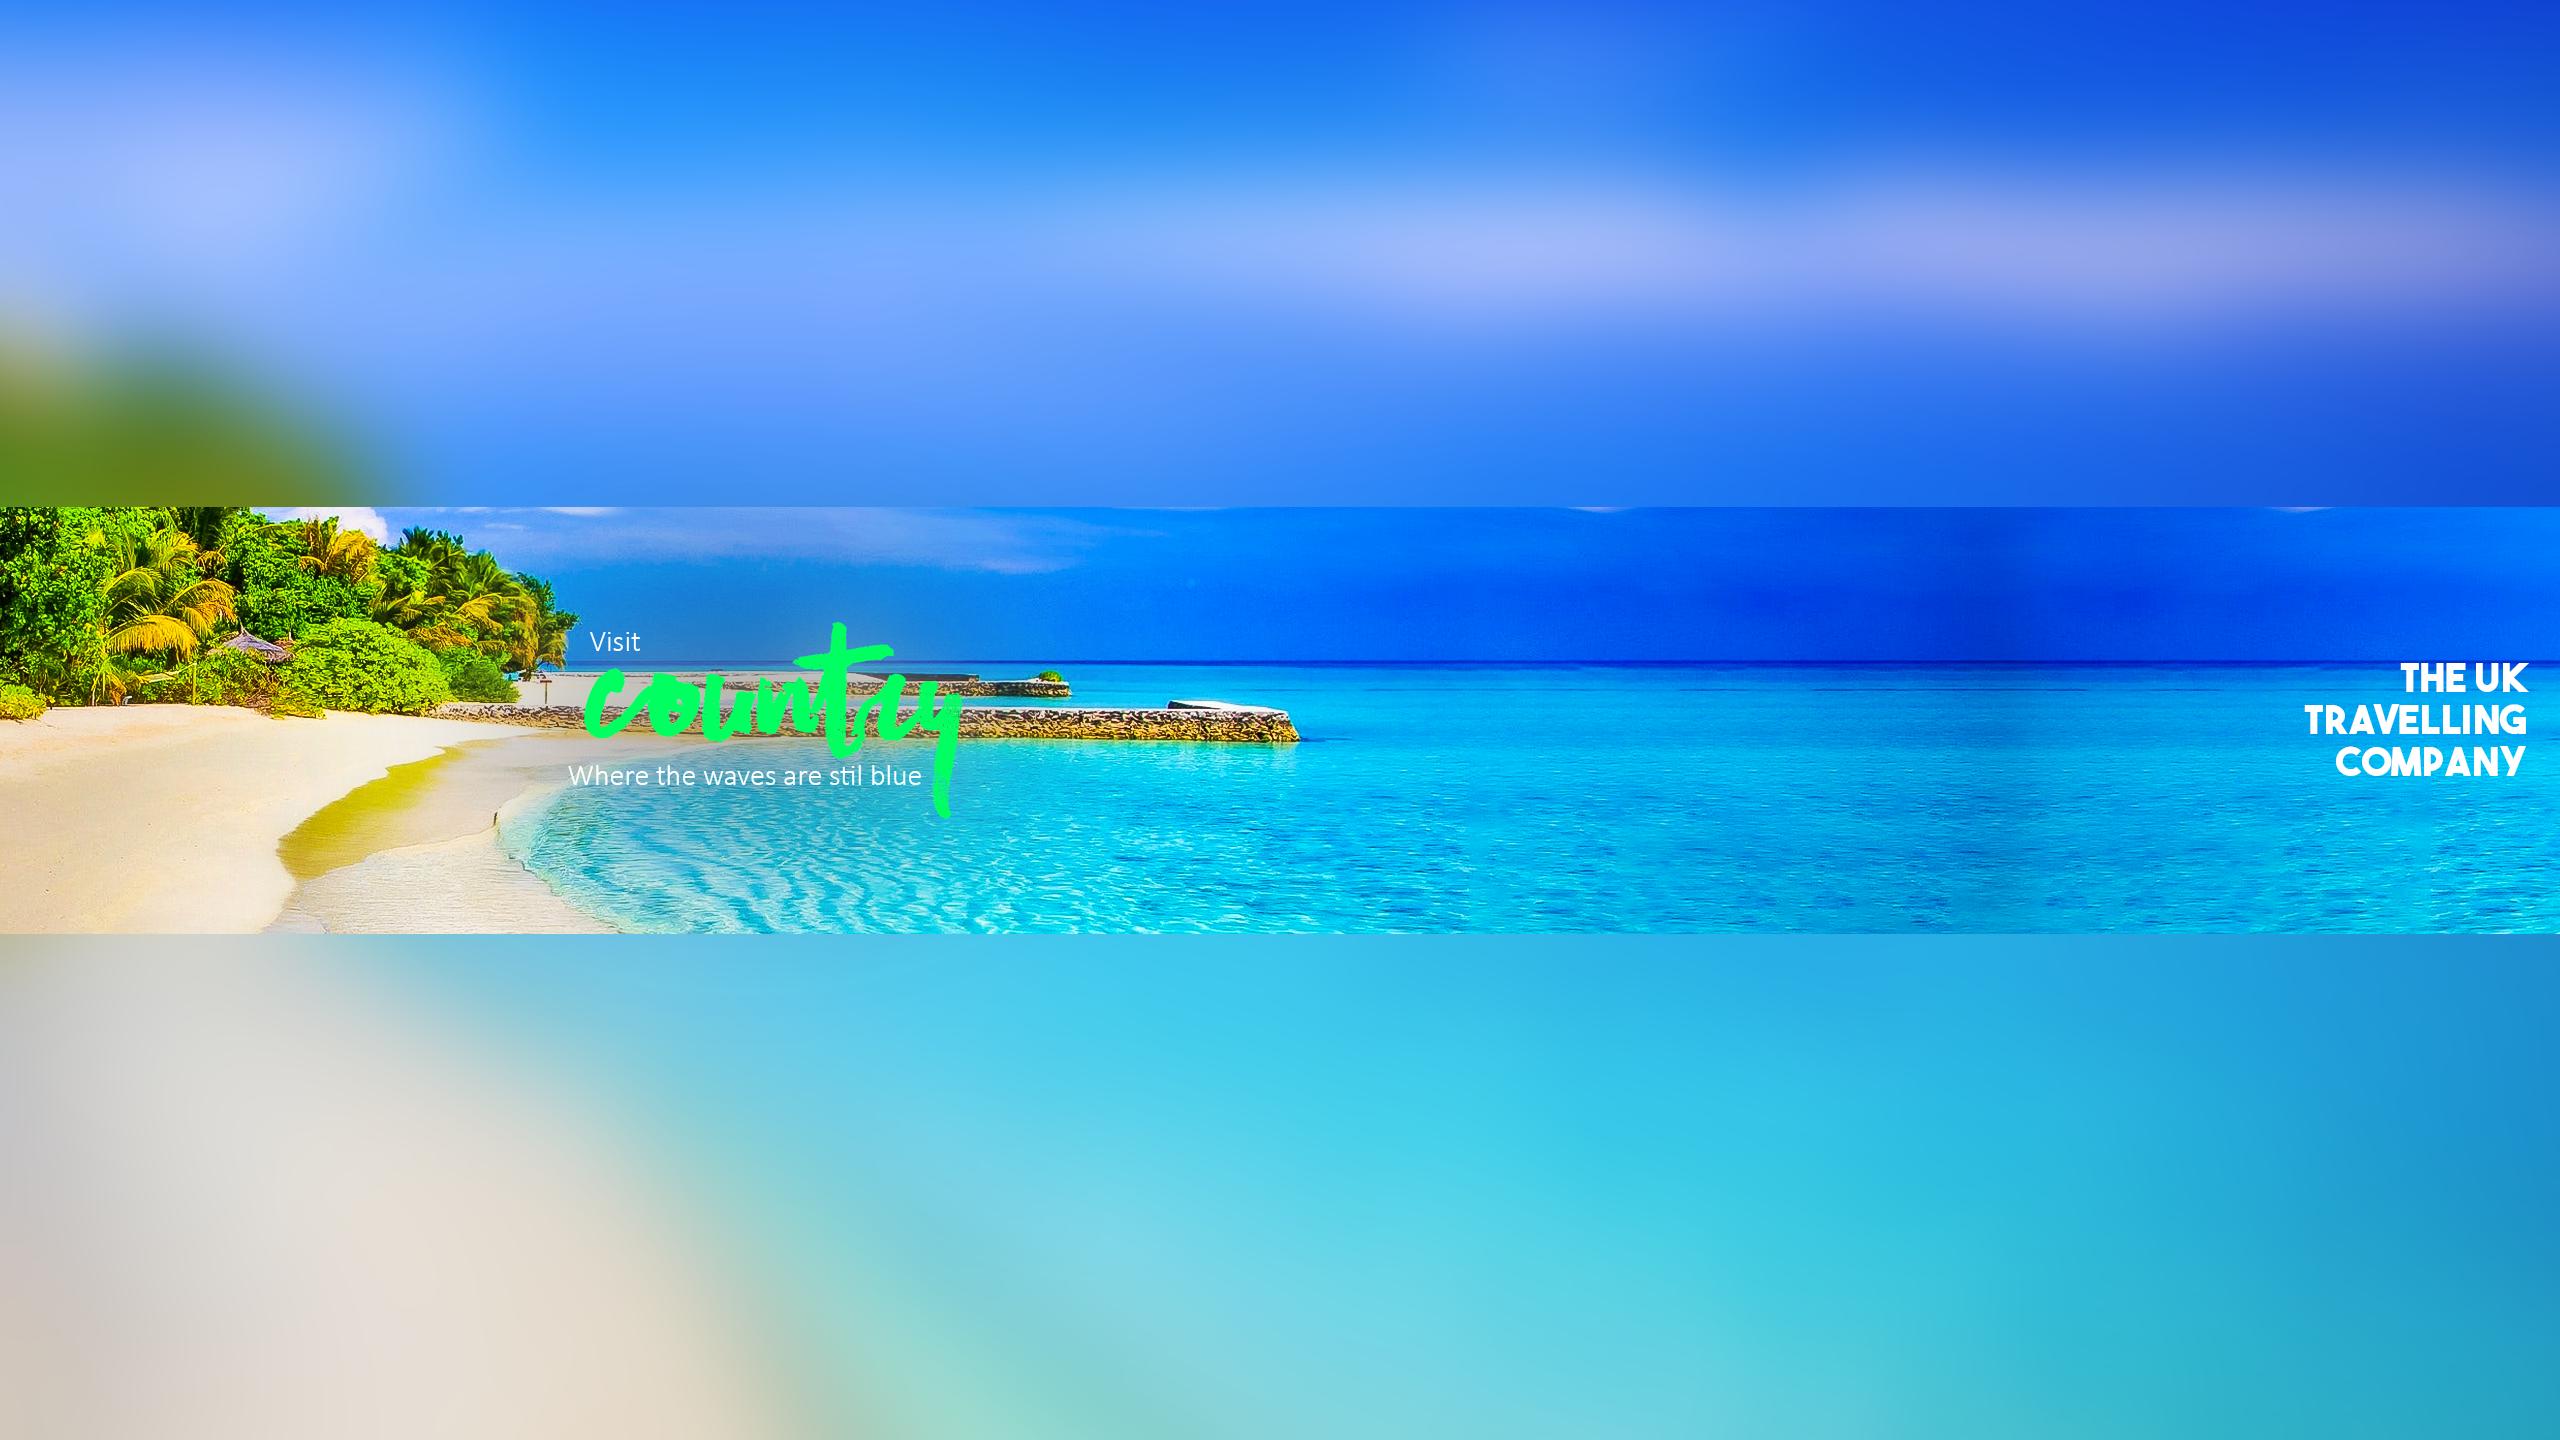 Tourism Banner